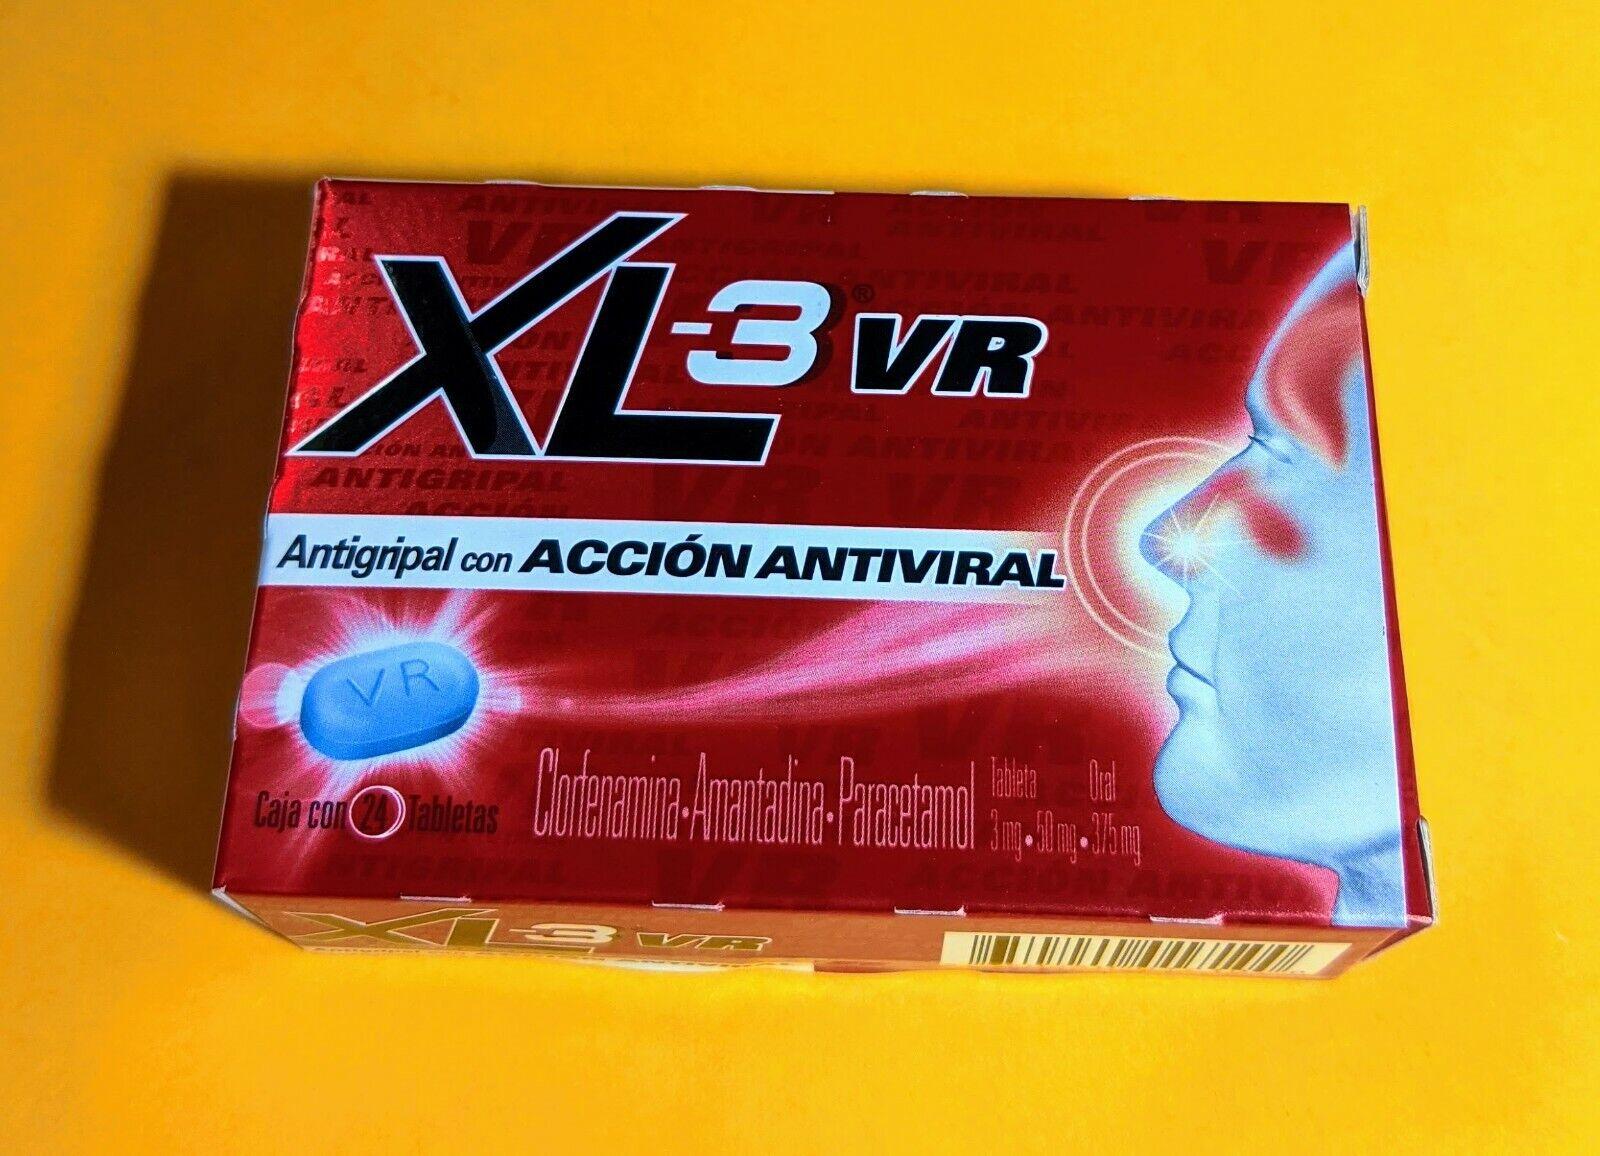 XL-3 Xtra VR Cold & Cough MEXICANO  Medicine Antigripal Anti